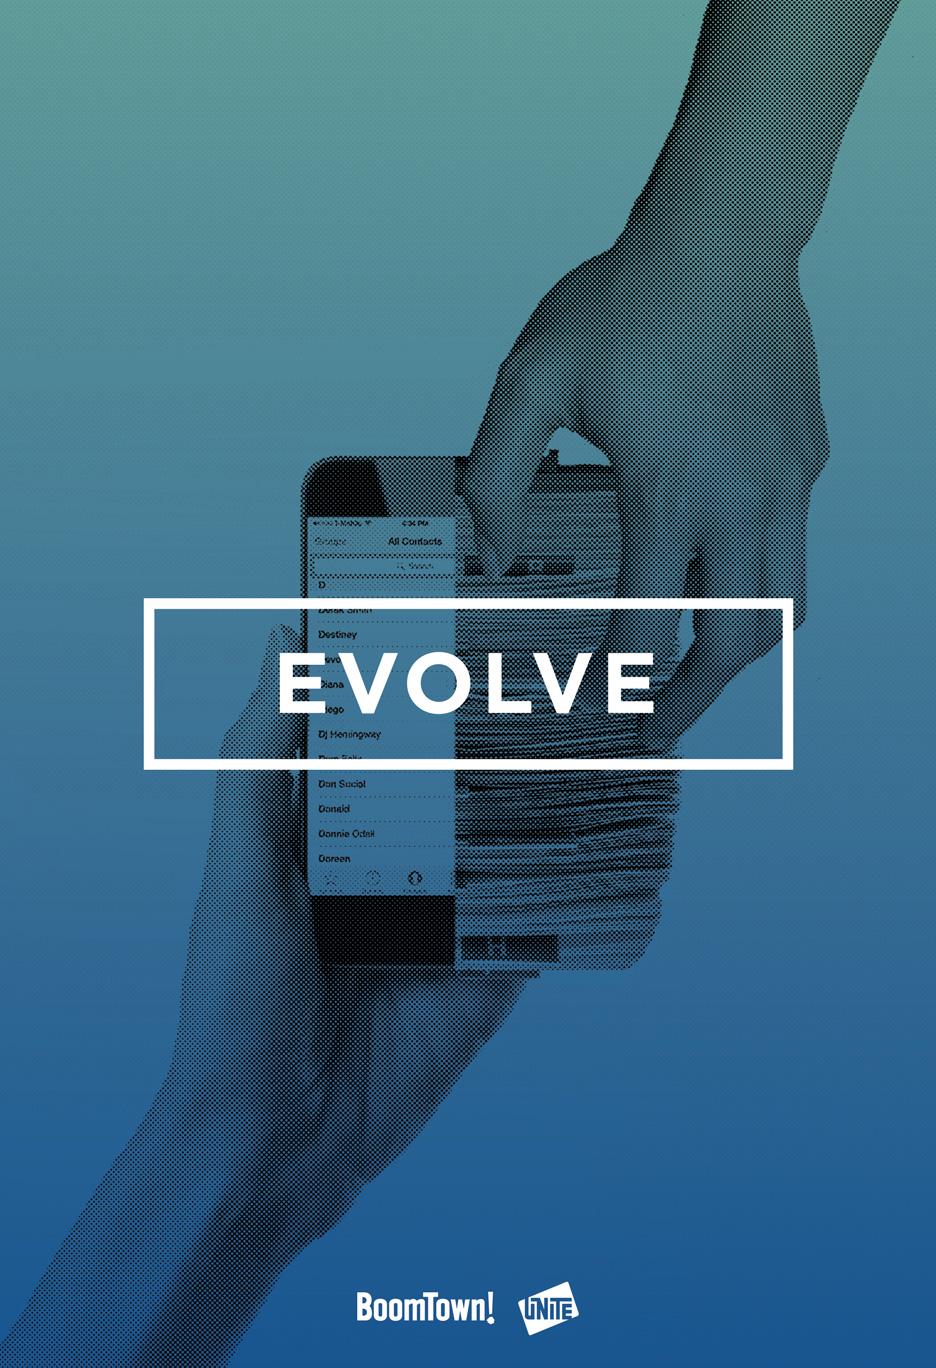 evolve-2.jpg